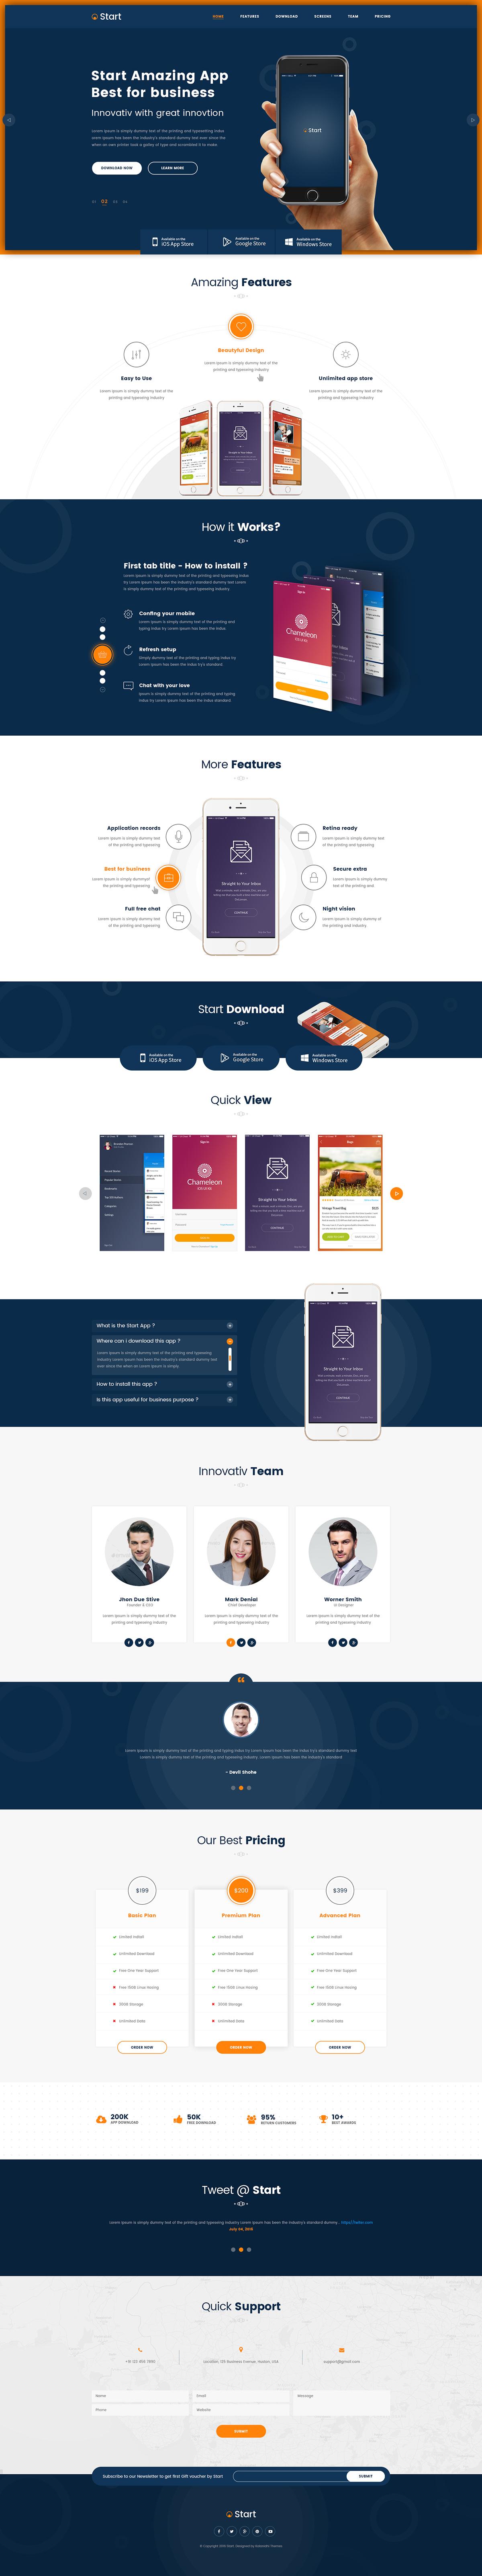 Start - App Landing Page HTML Template on Behance